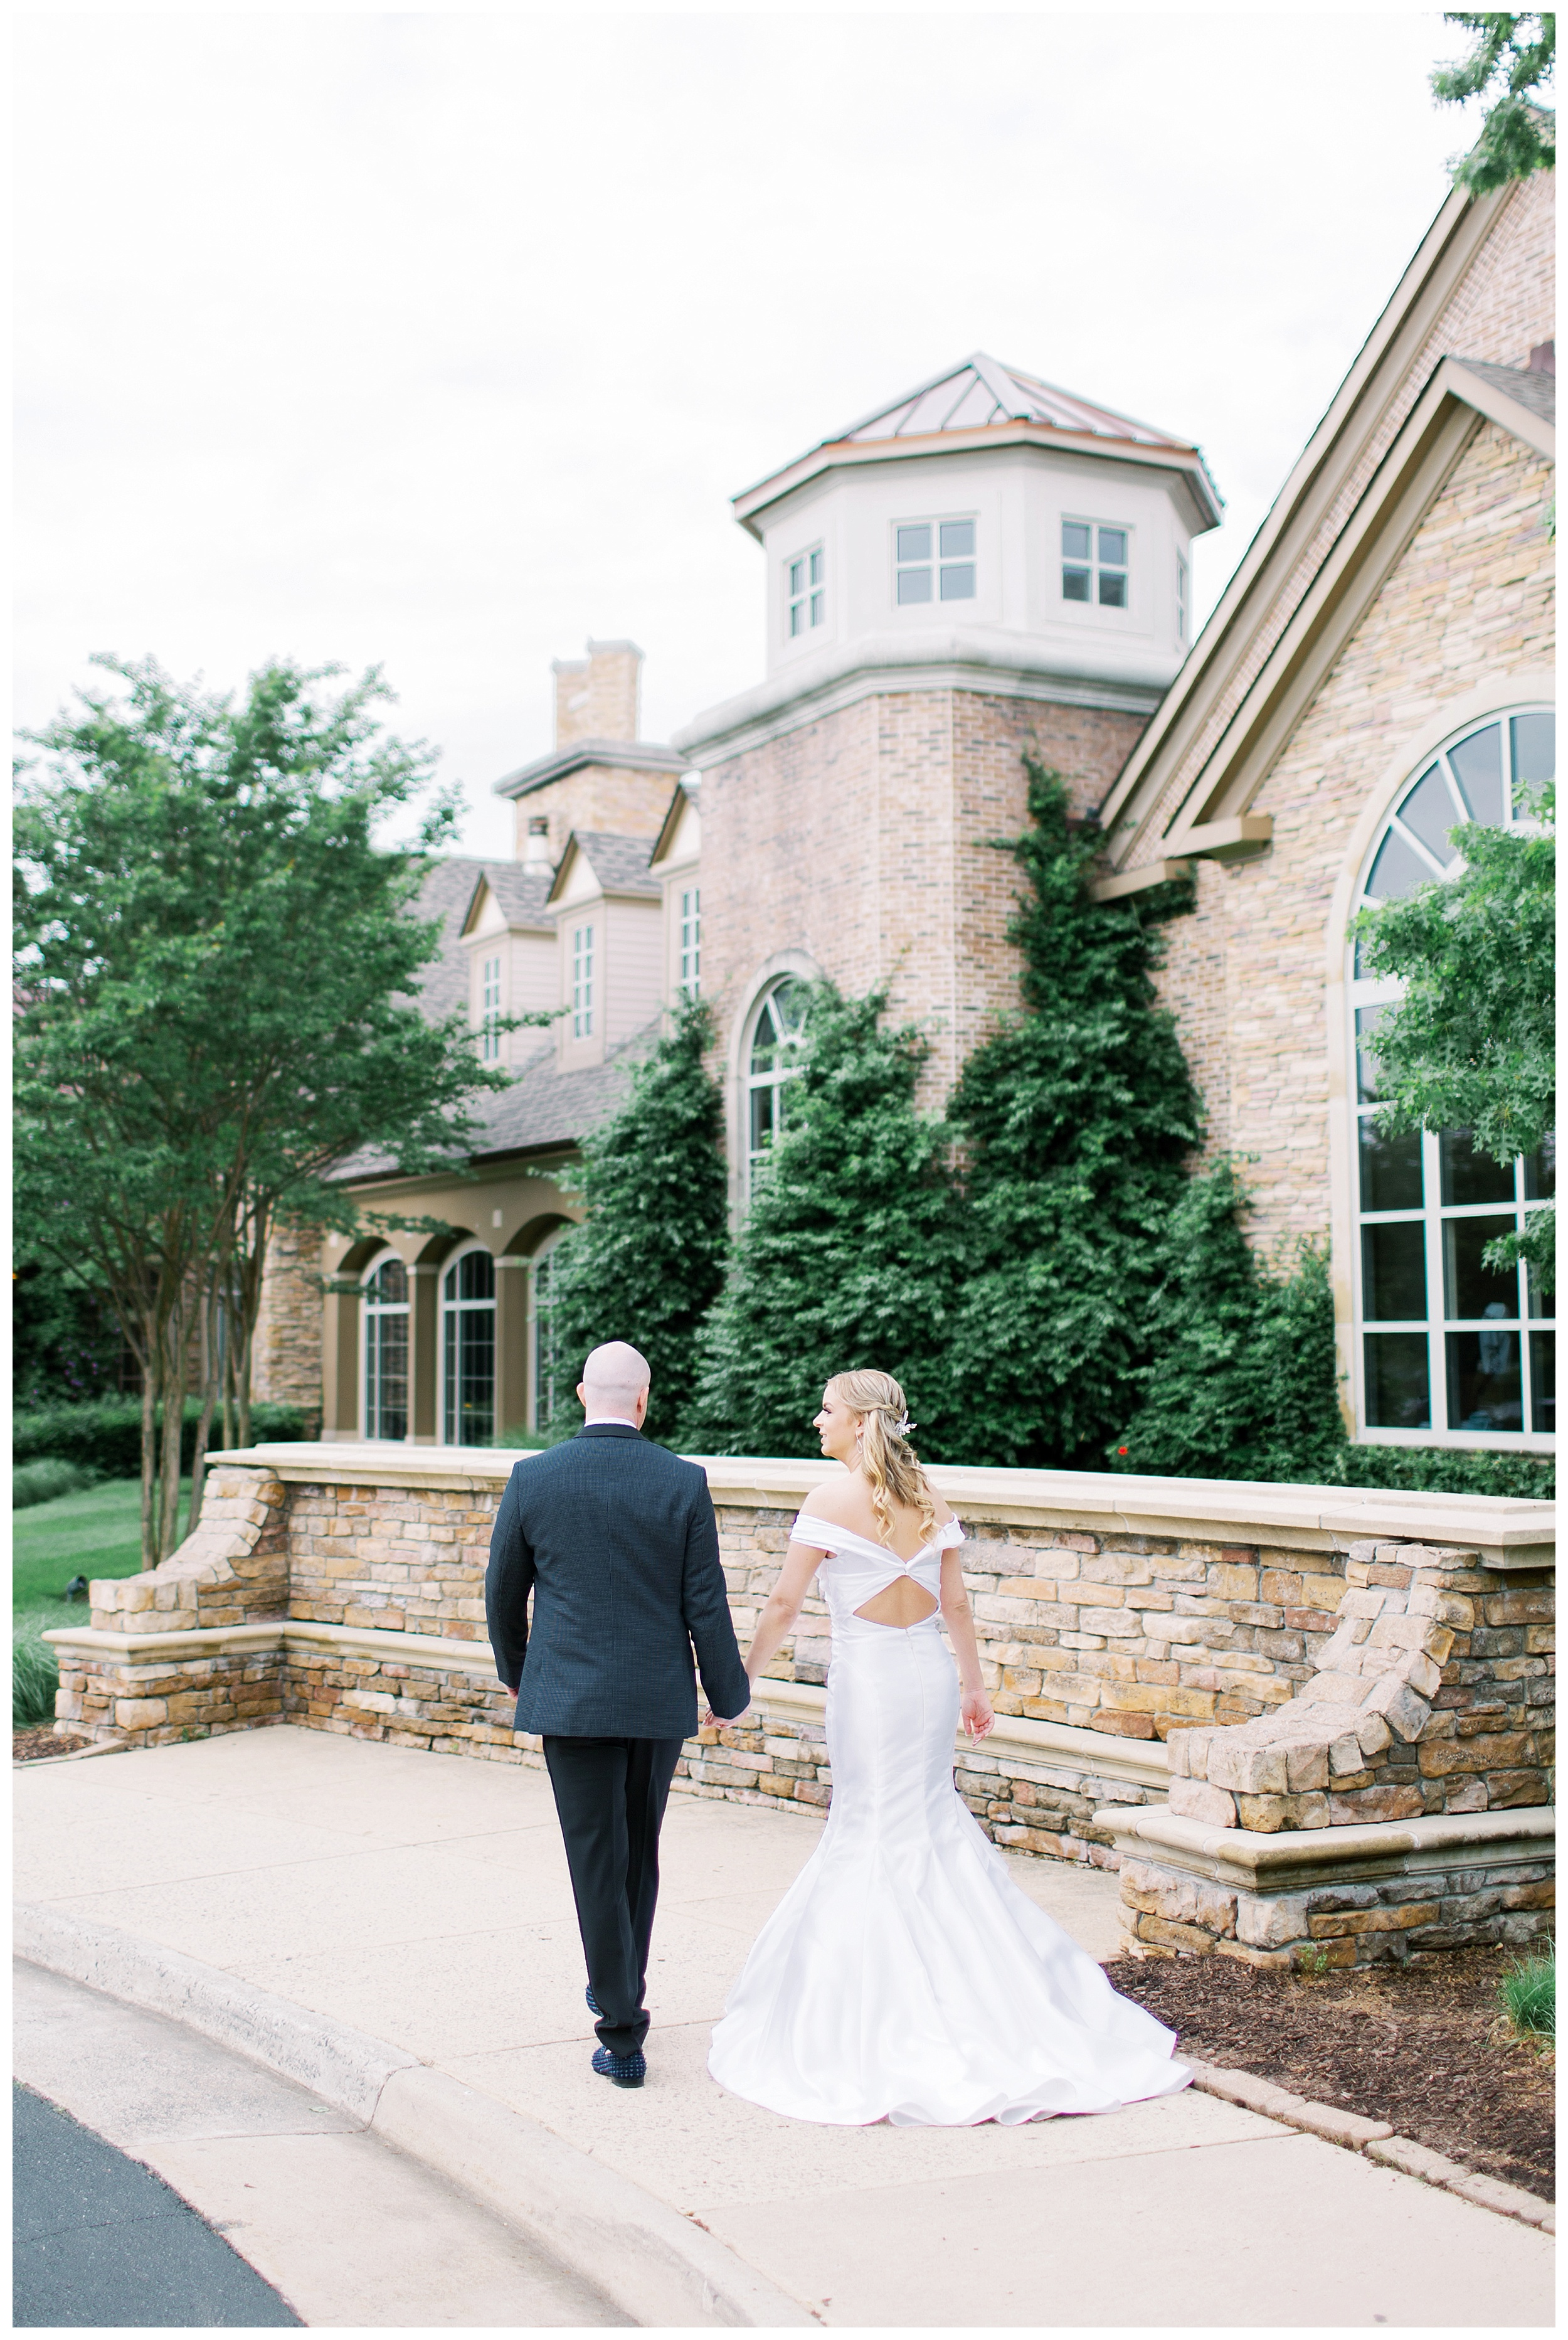 Lansdowne Resort Wedding | Virginia Film Wedding Photographer Kir Tuben_0041.jpg